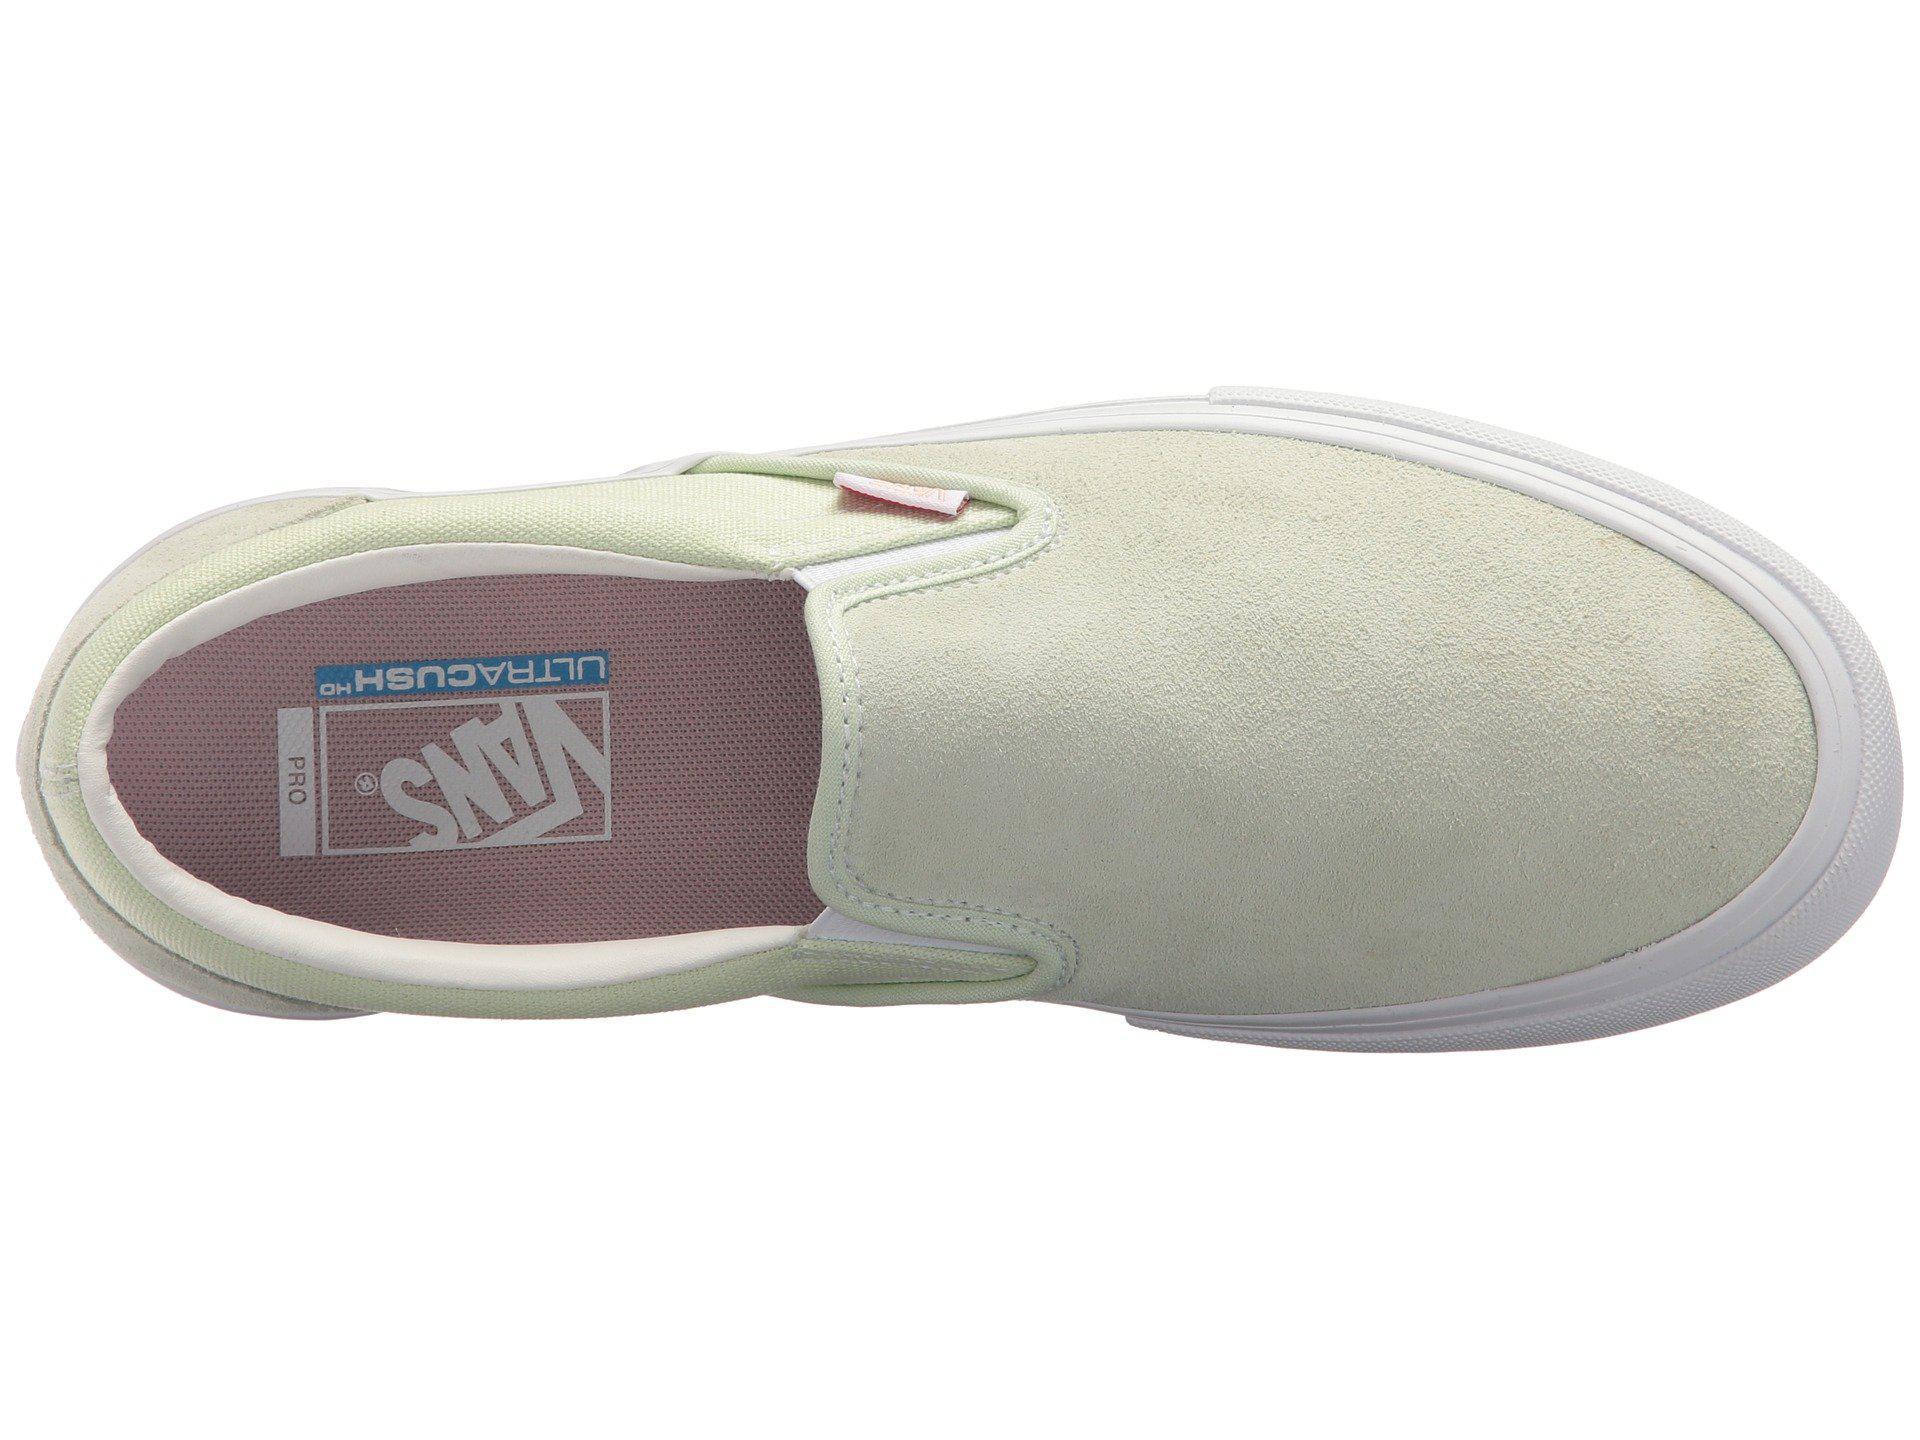 cfdec79fbbe560 Lyst - Vans Slip-on Pro ((independent) Black white) Men s Skate ...